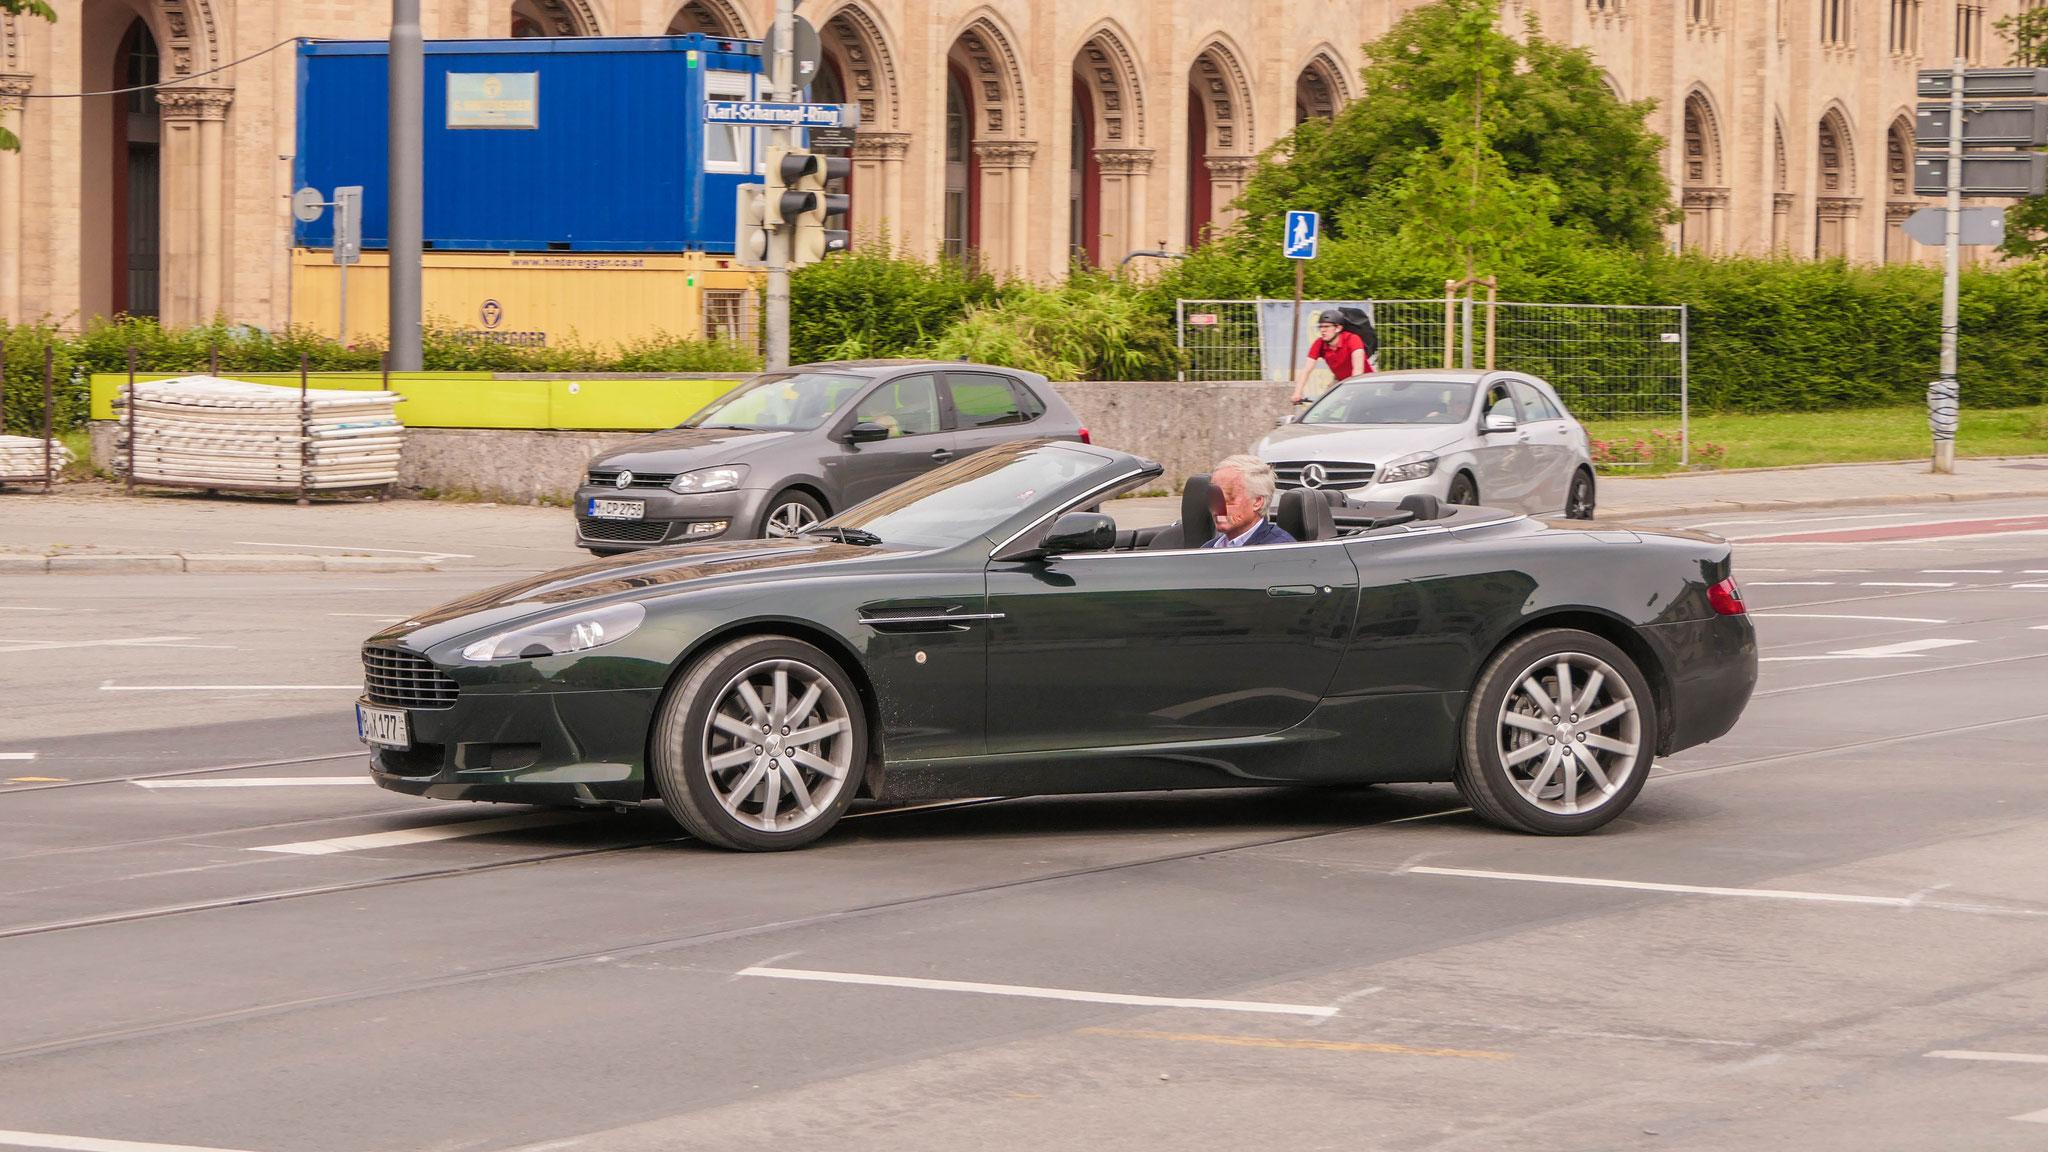 Aston Martin DB9 Volante - MB-X-177